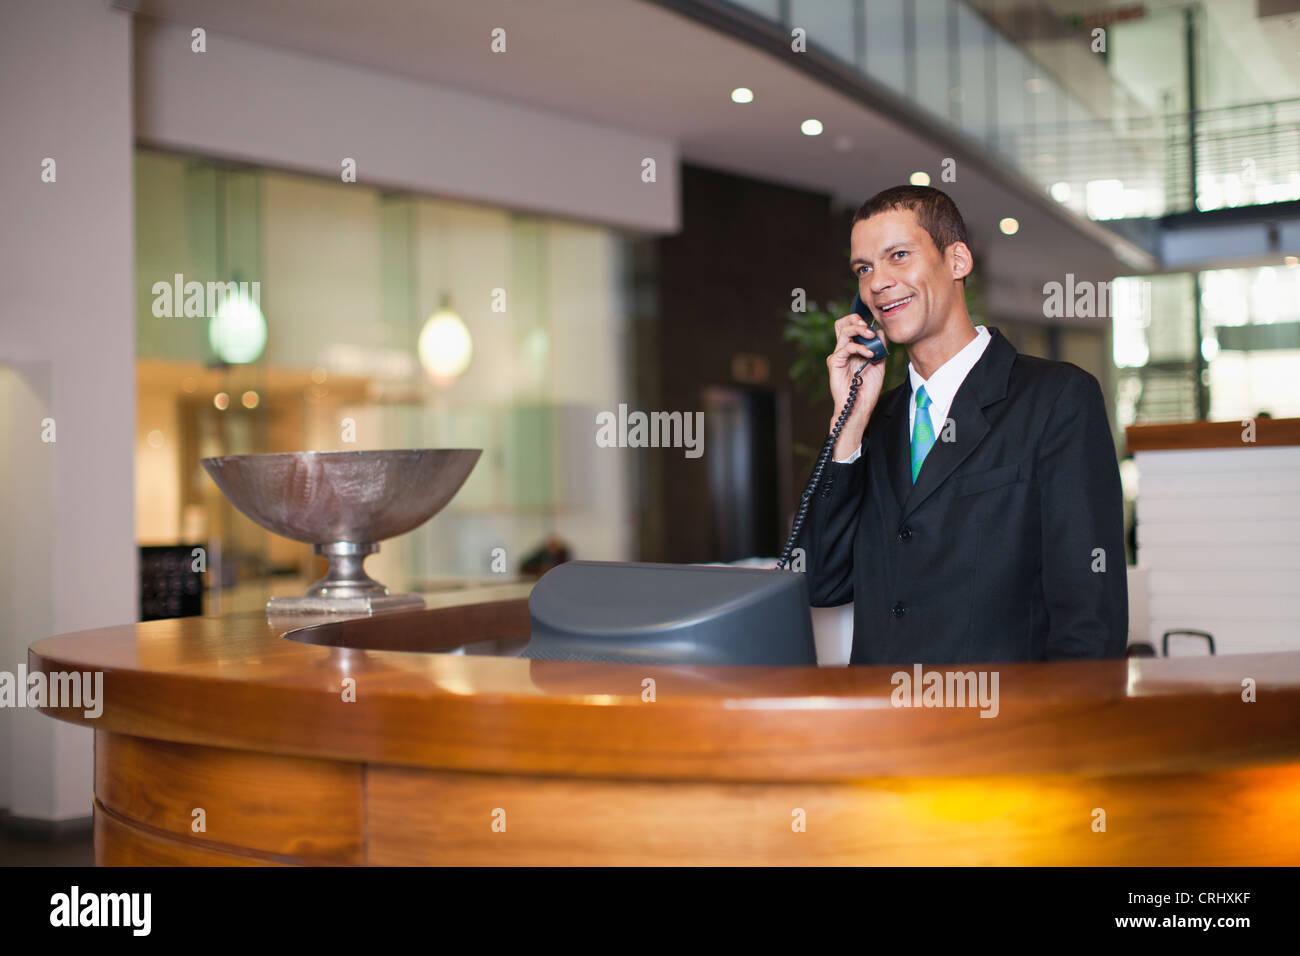 Concierge des Hotels am Telefon sprechen Stockbild